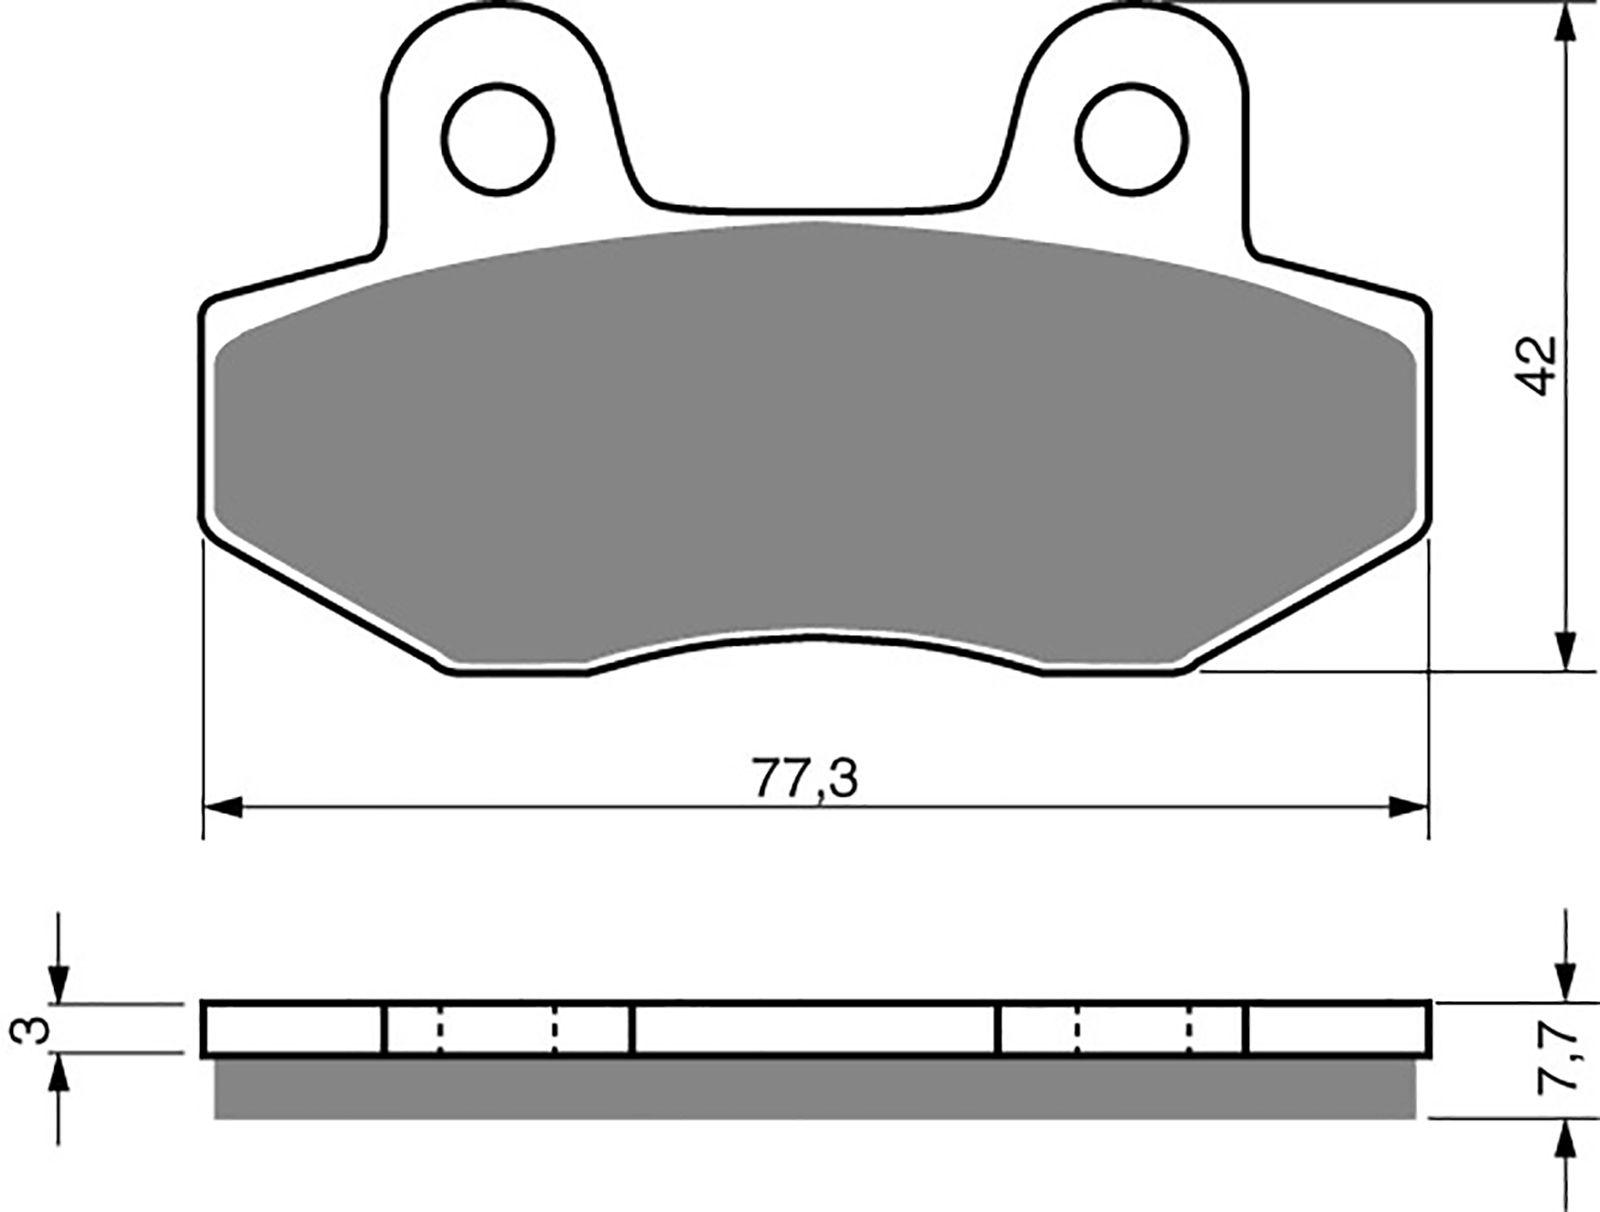 goldfren s33 brake pads - 700011GS image